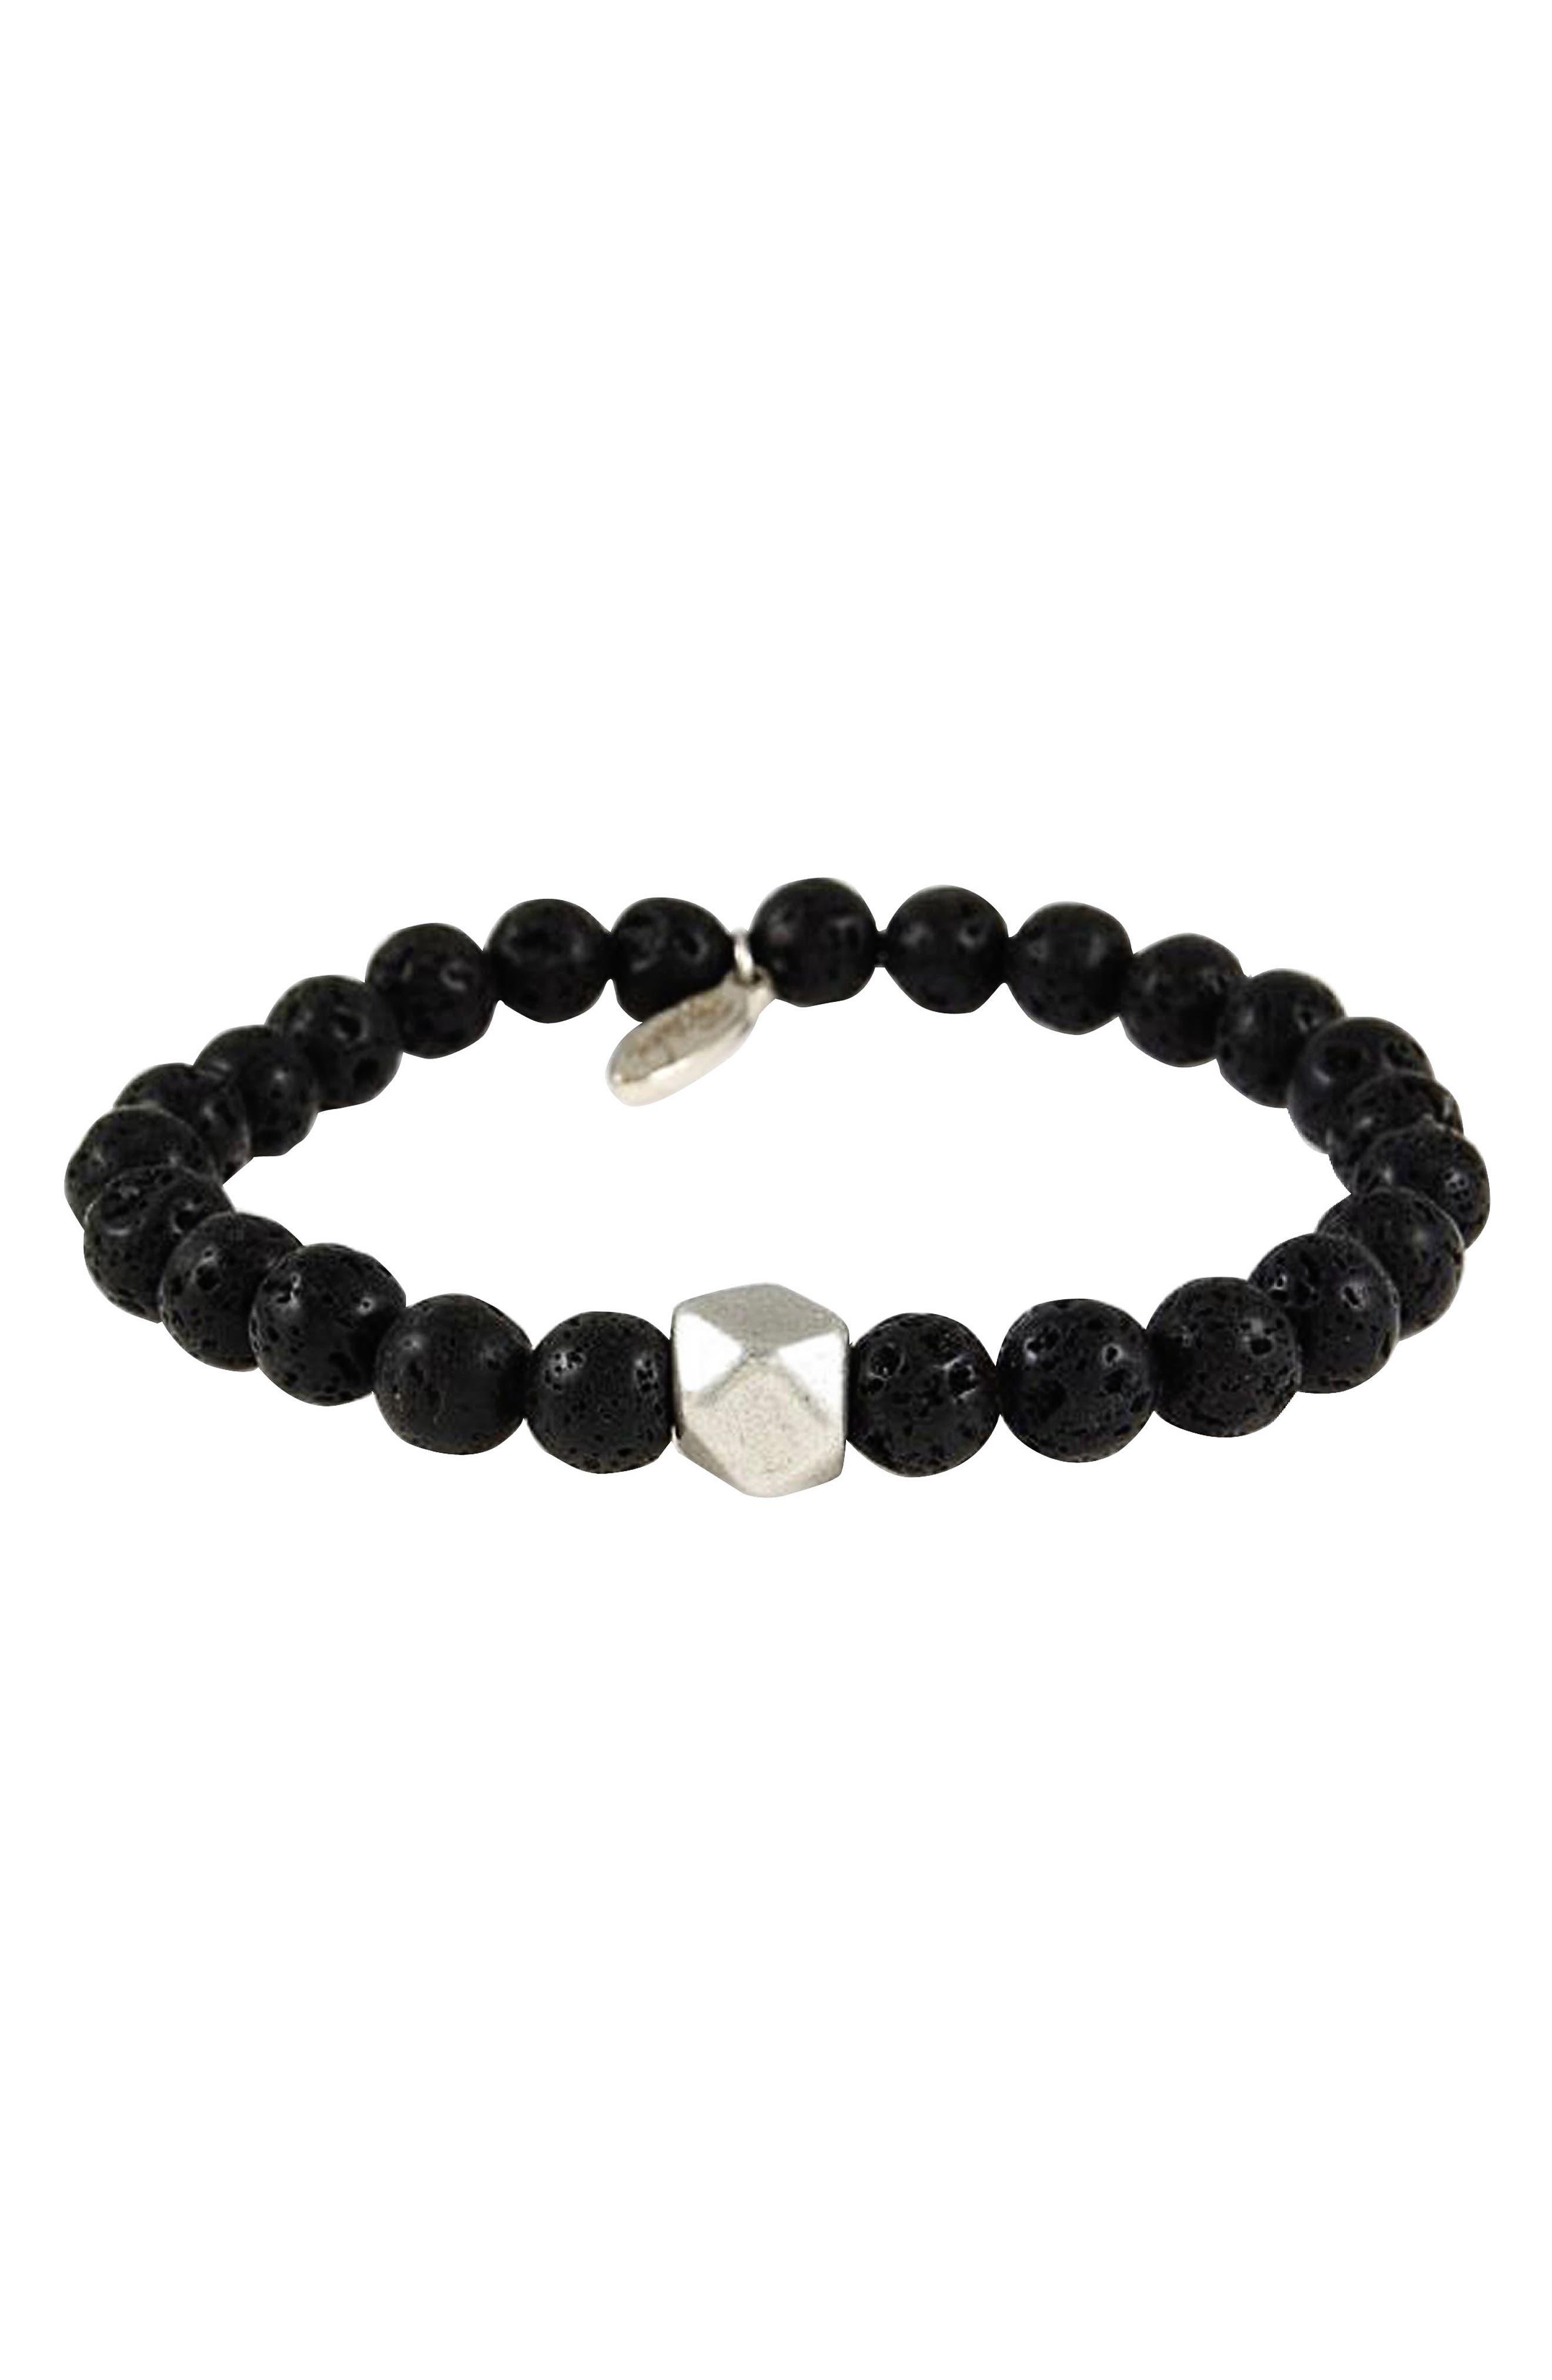 Onyx Stretch Bracelet,                             Main thumbnail 1, color,                             Black